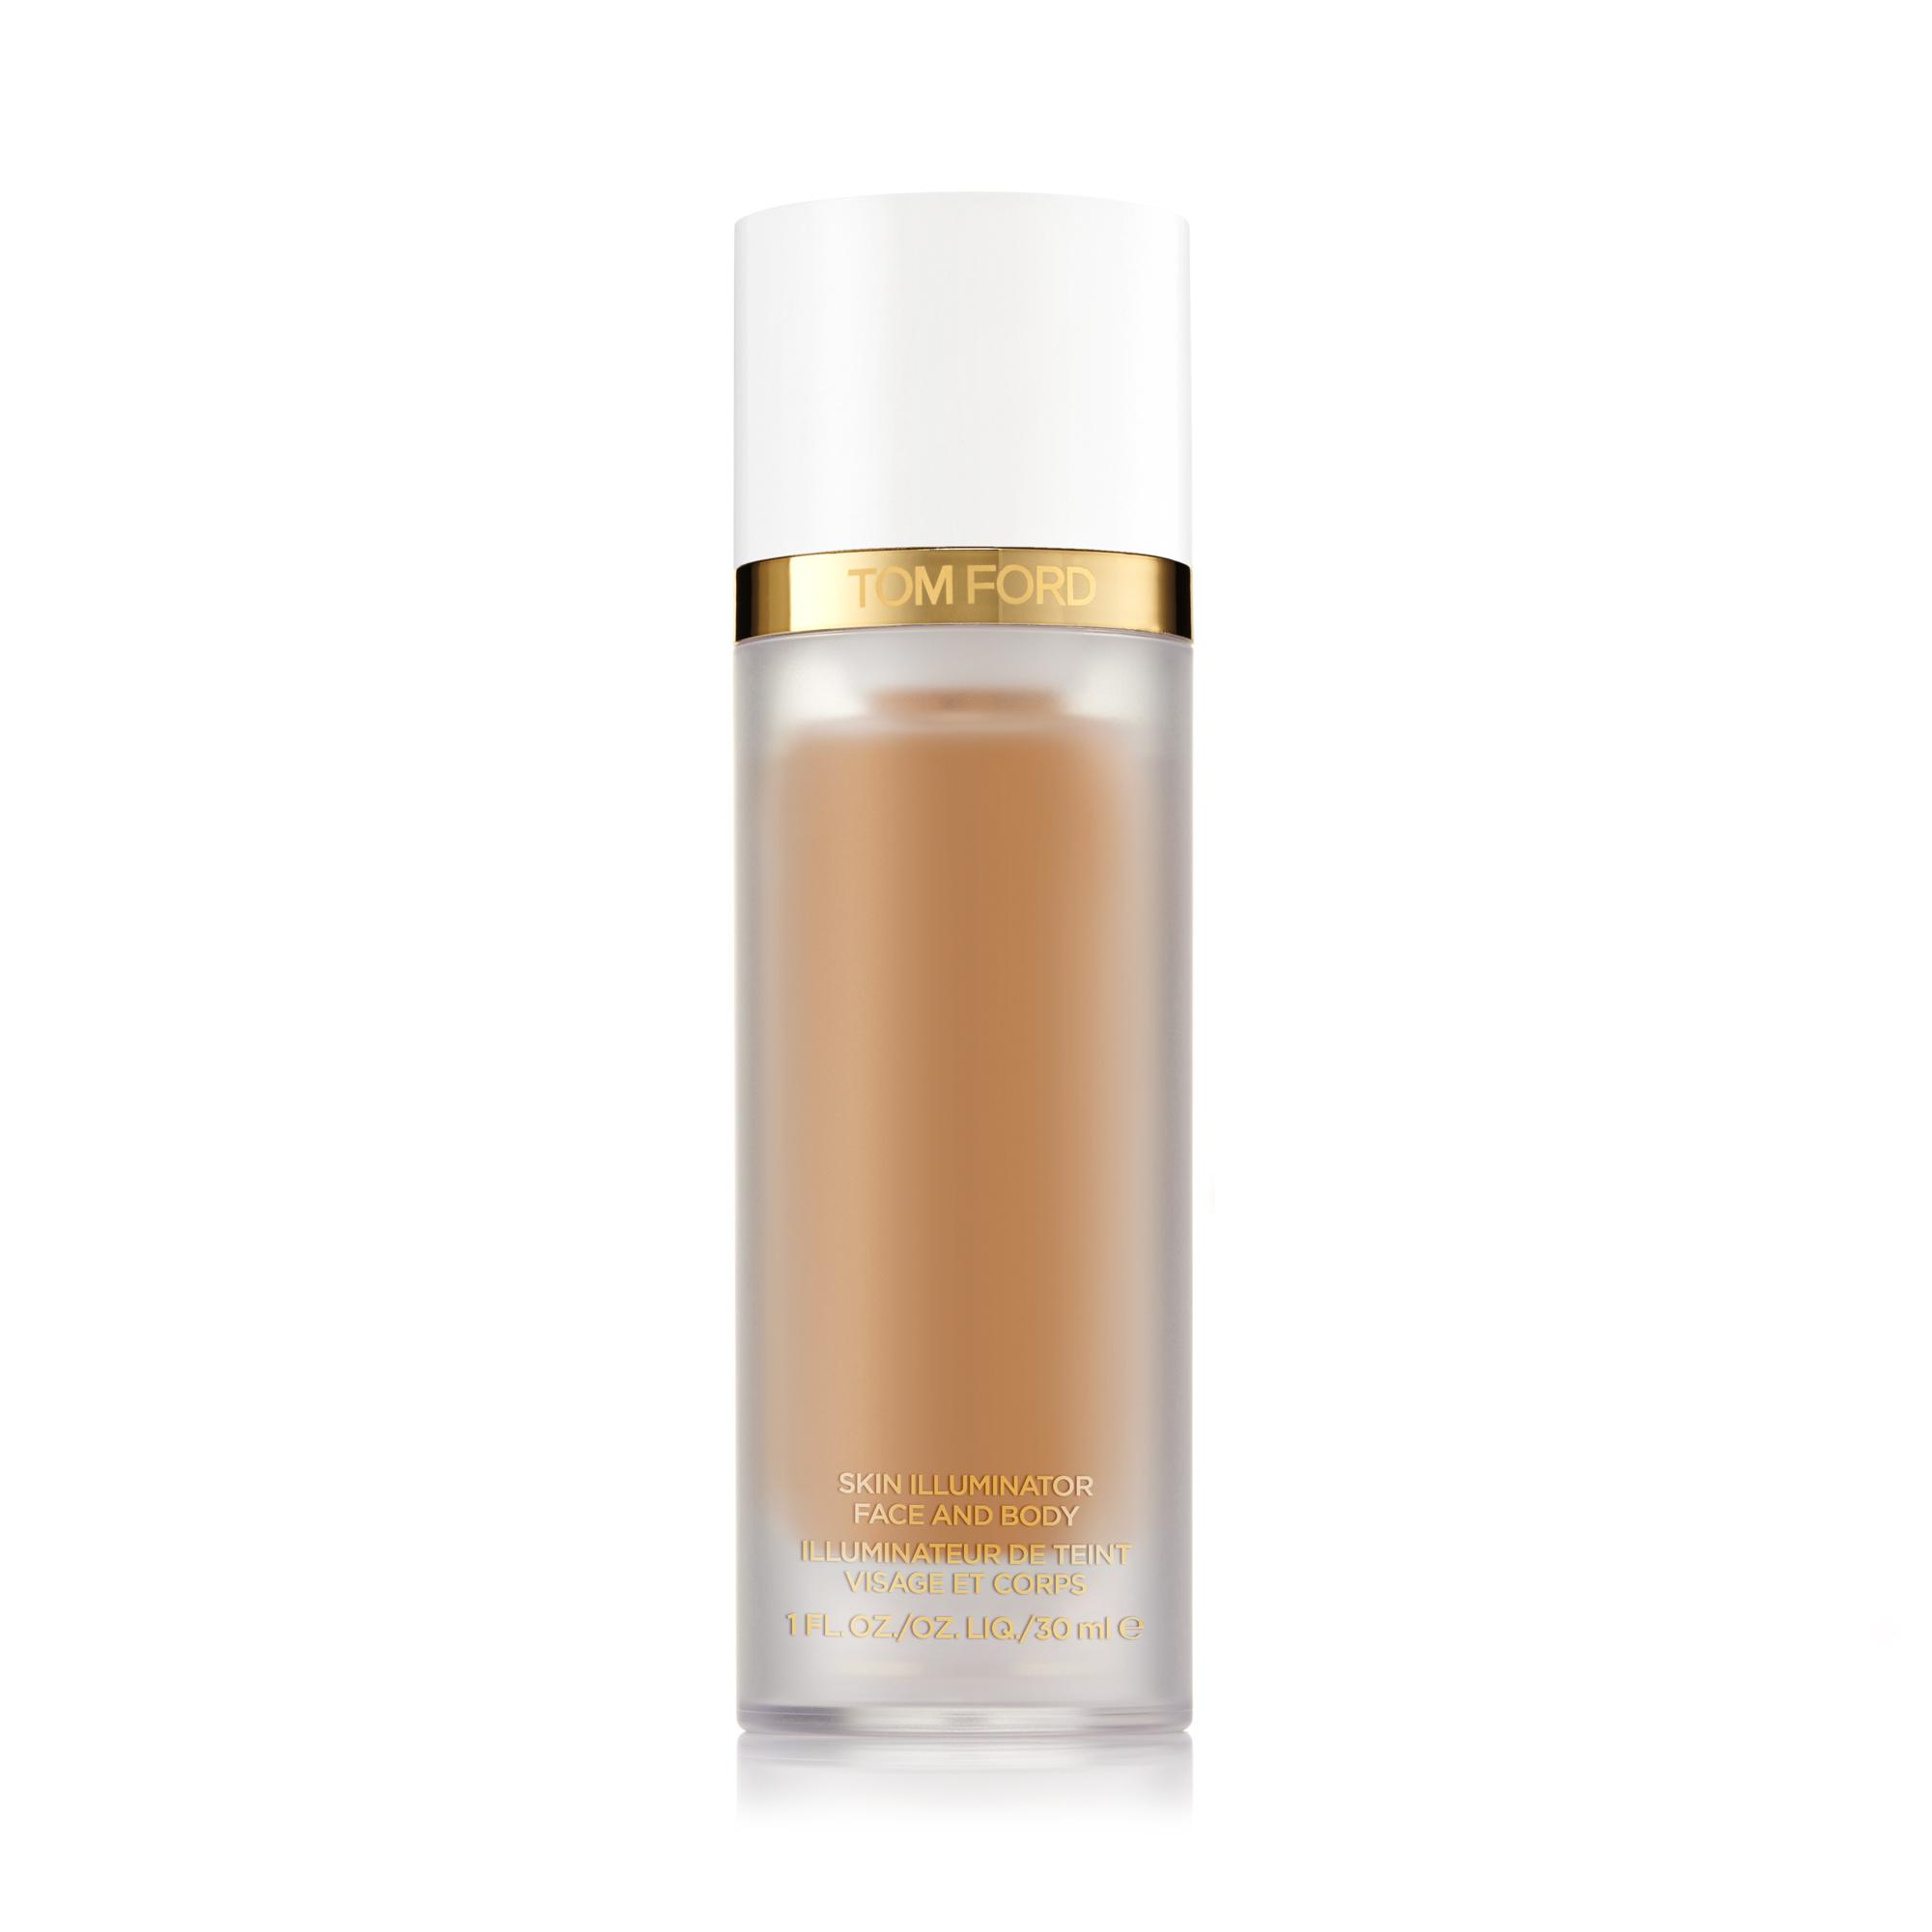 Skin Illuminator Face & Body, 02 - ROSE GLOW, large